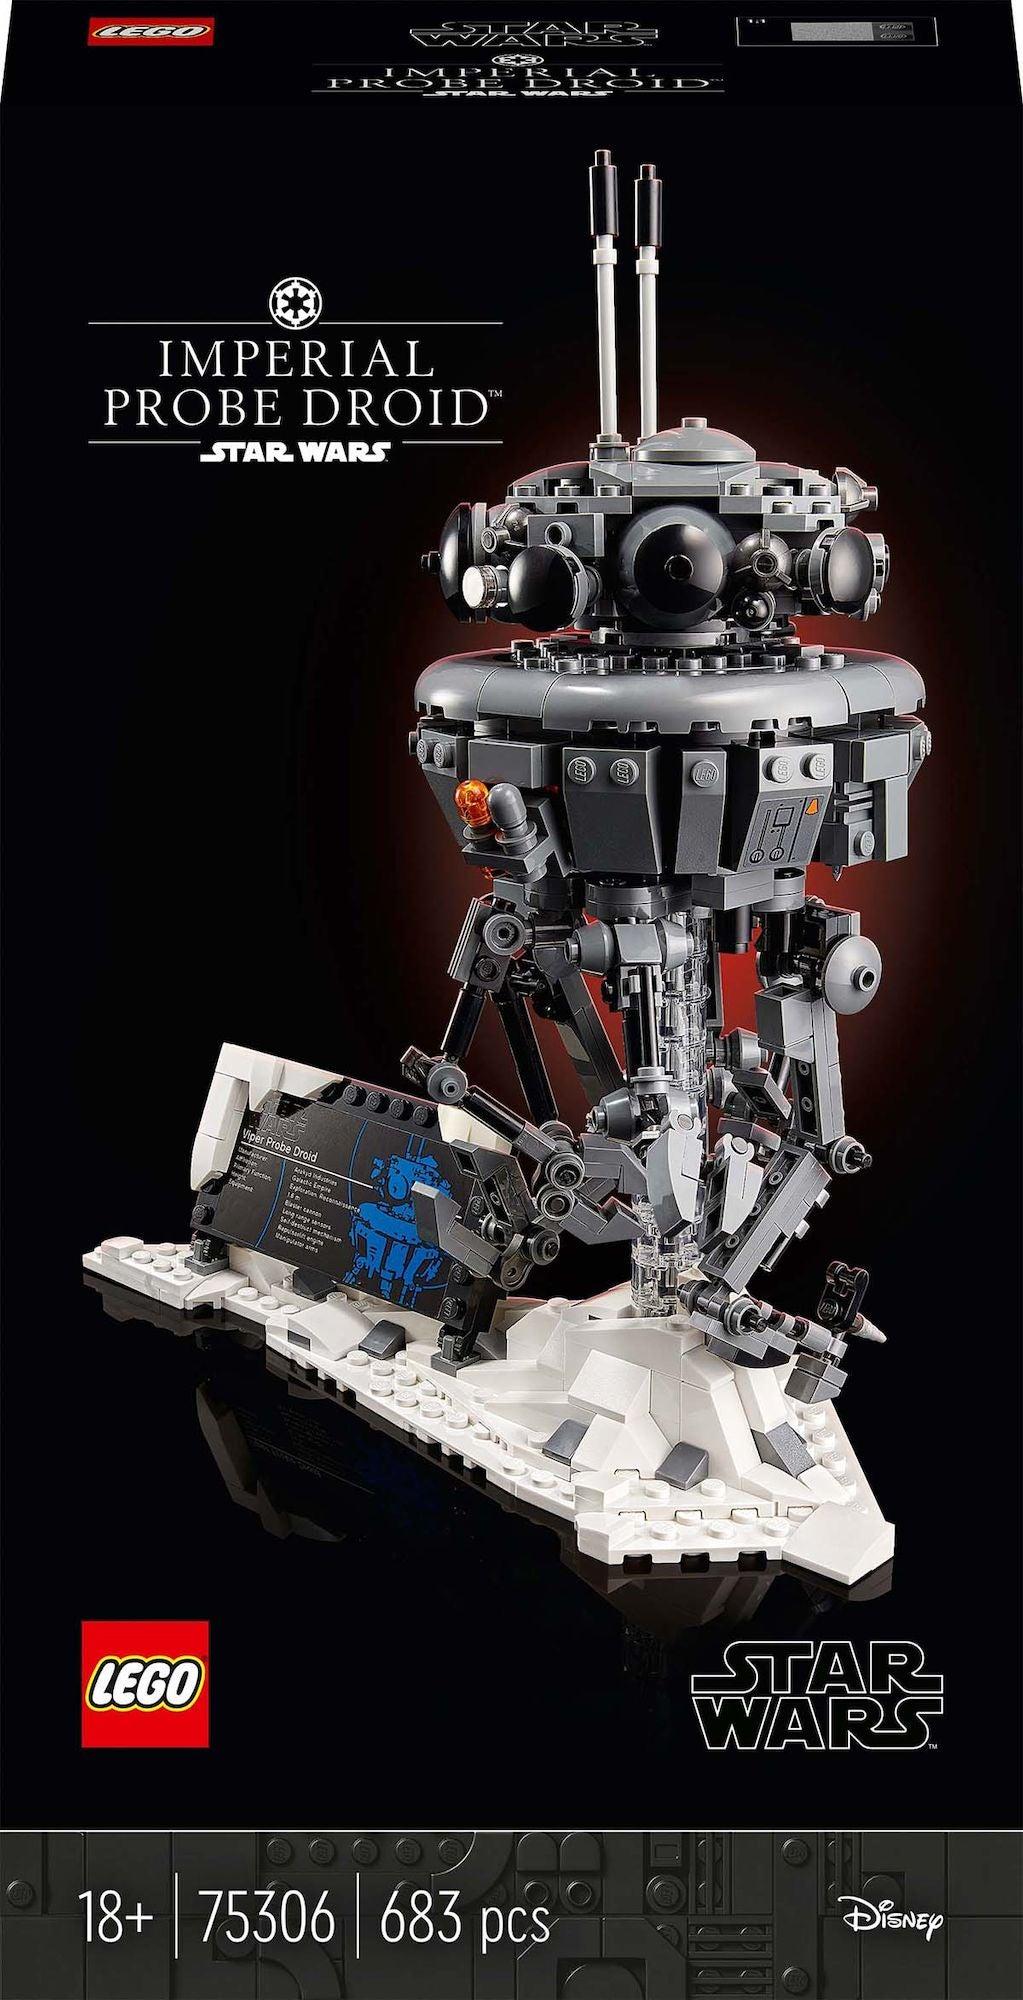 LEGO Star Wars 75306 Imperial Probe Droidi